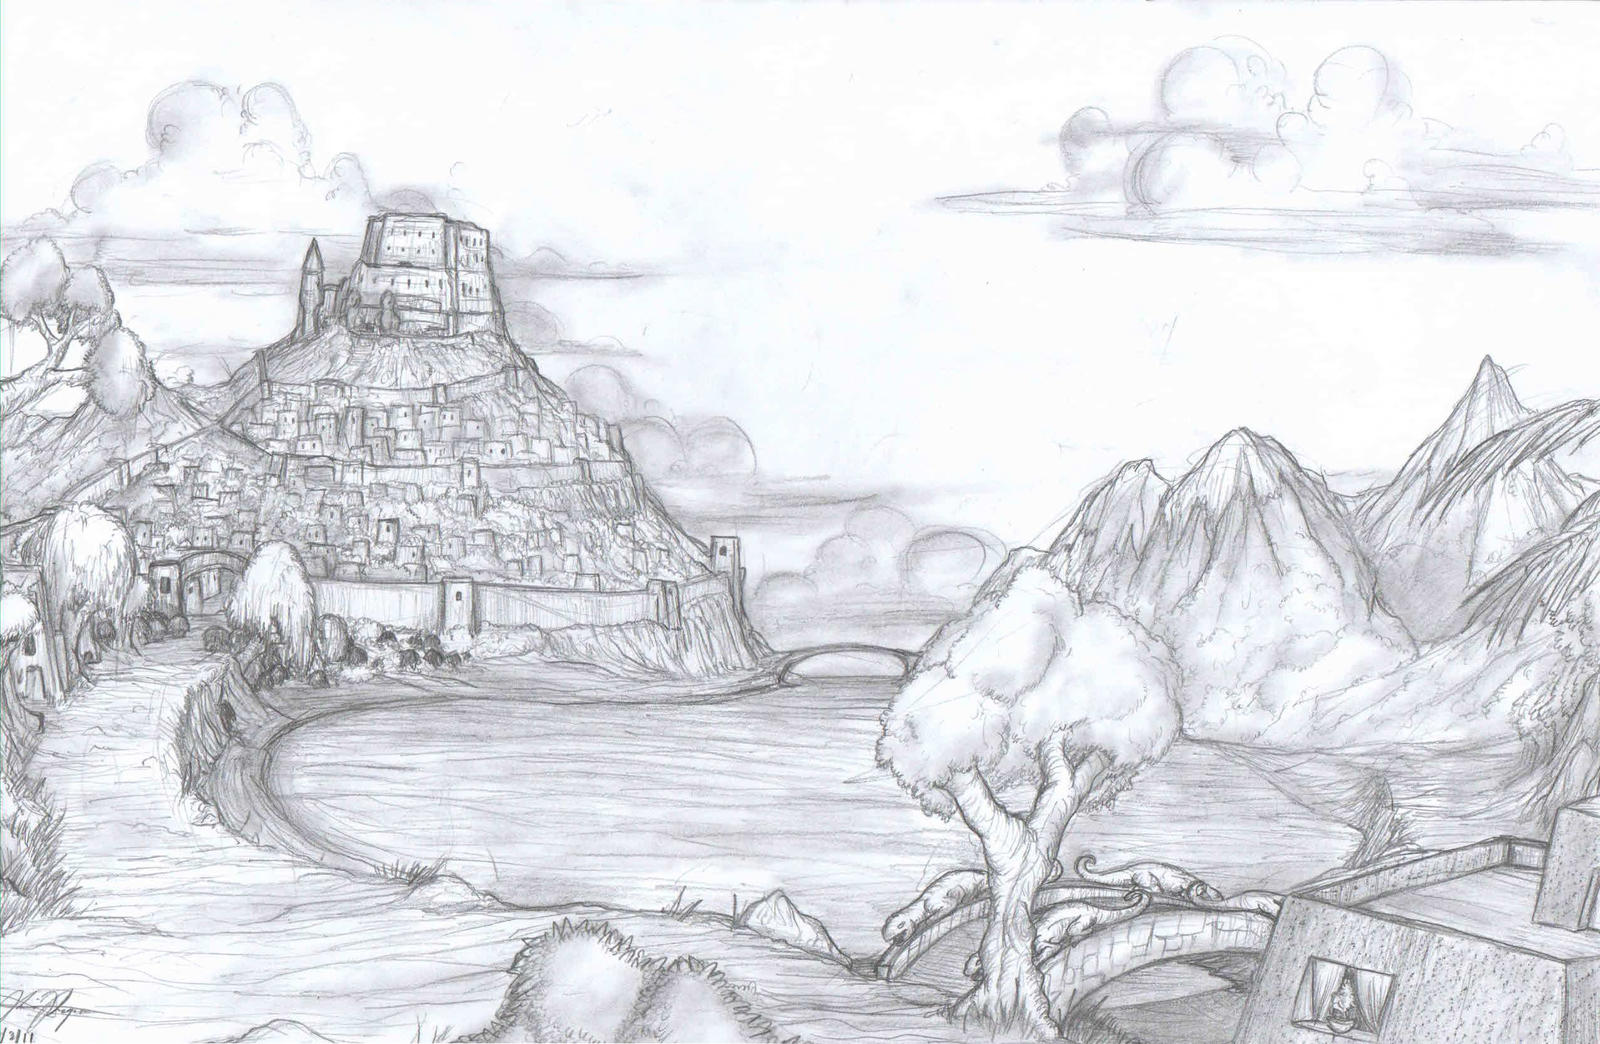 Xan'orthras by TargonRedDragon